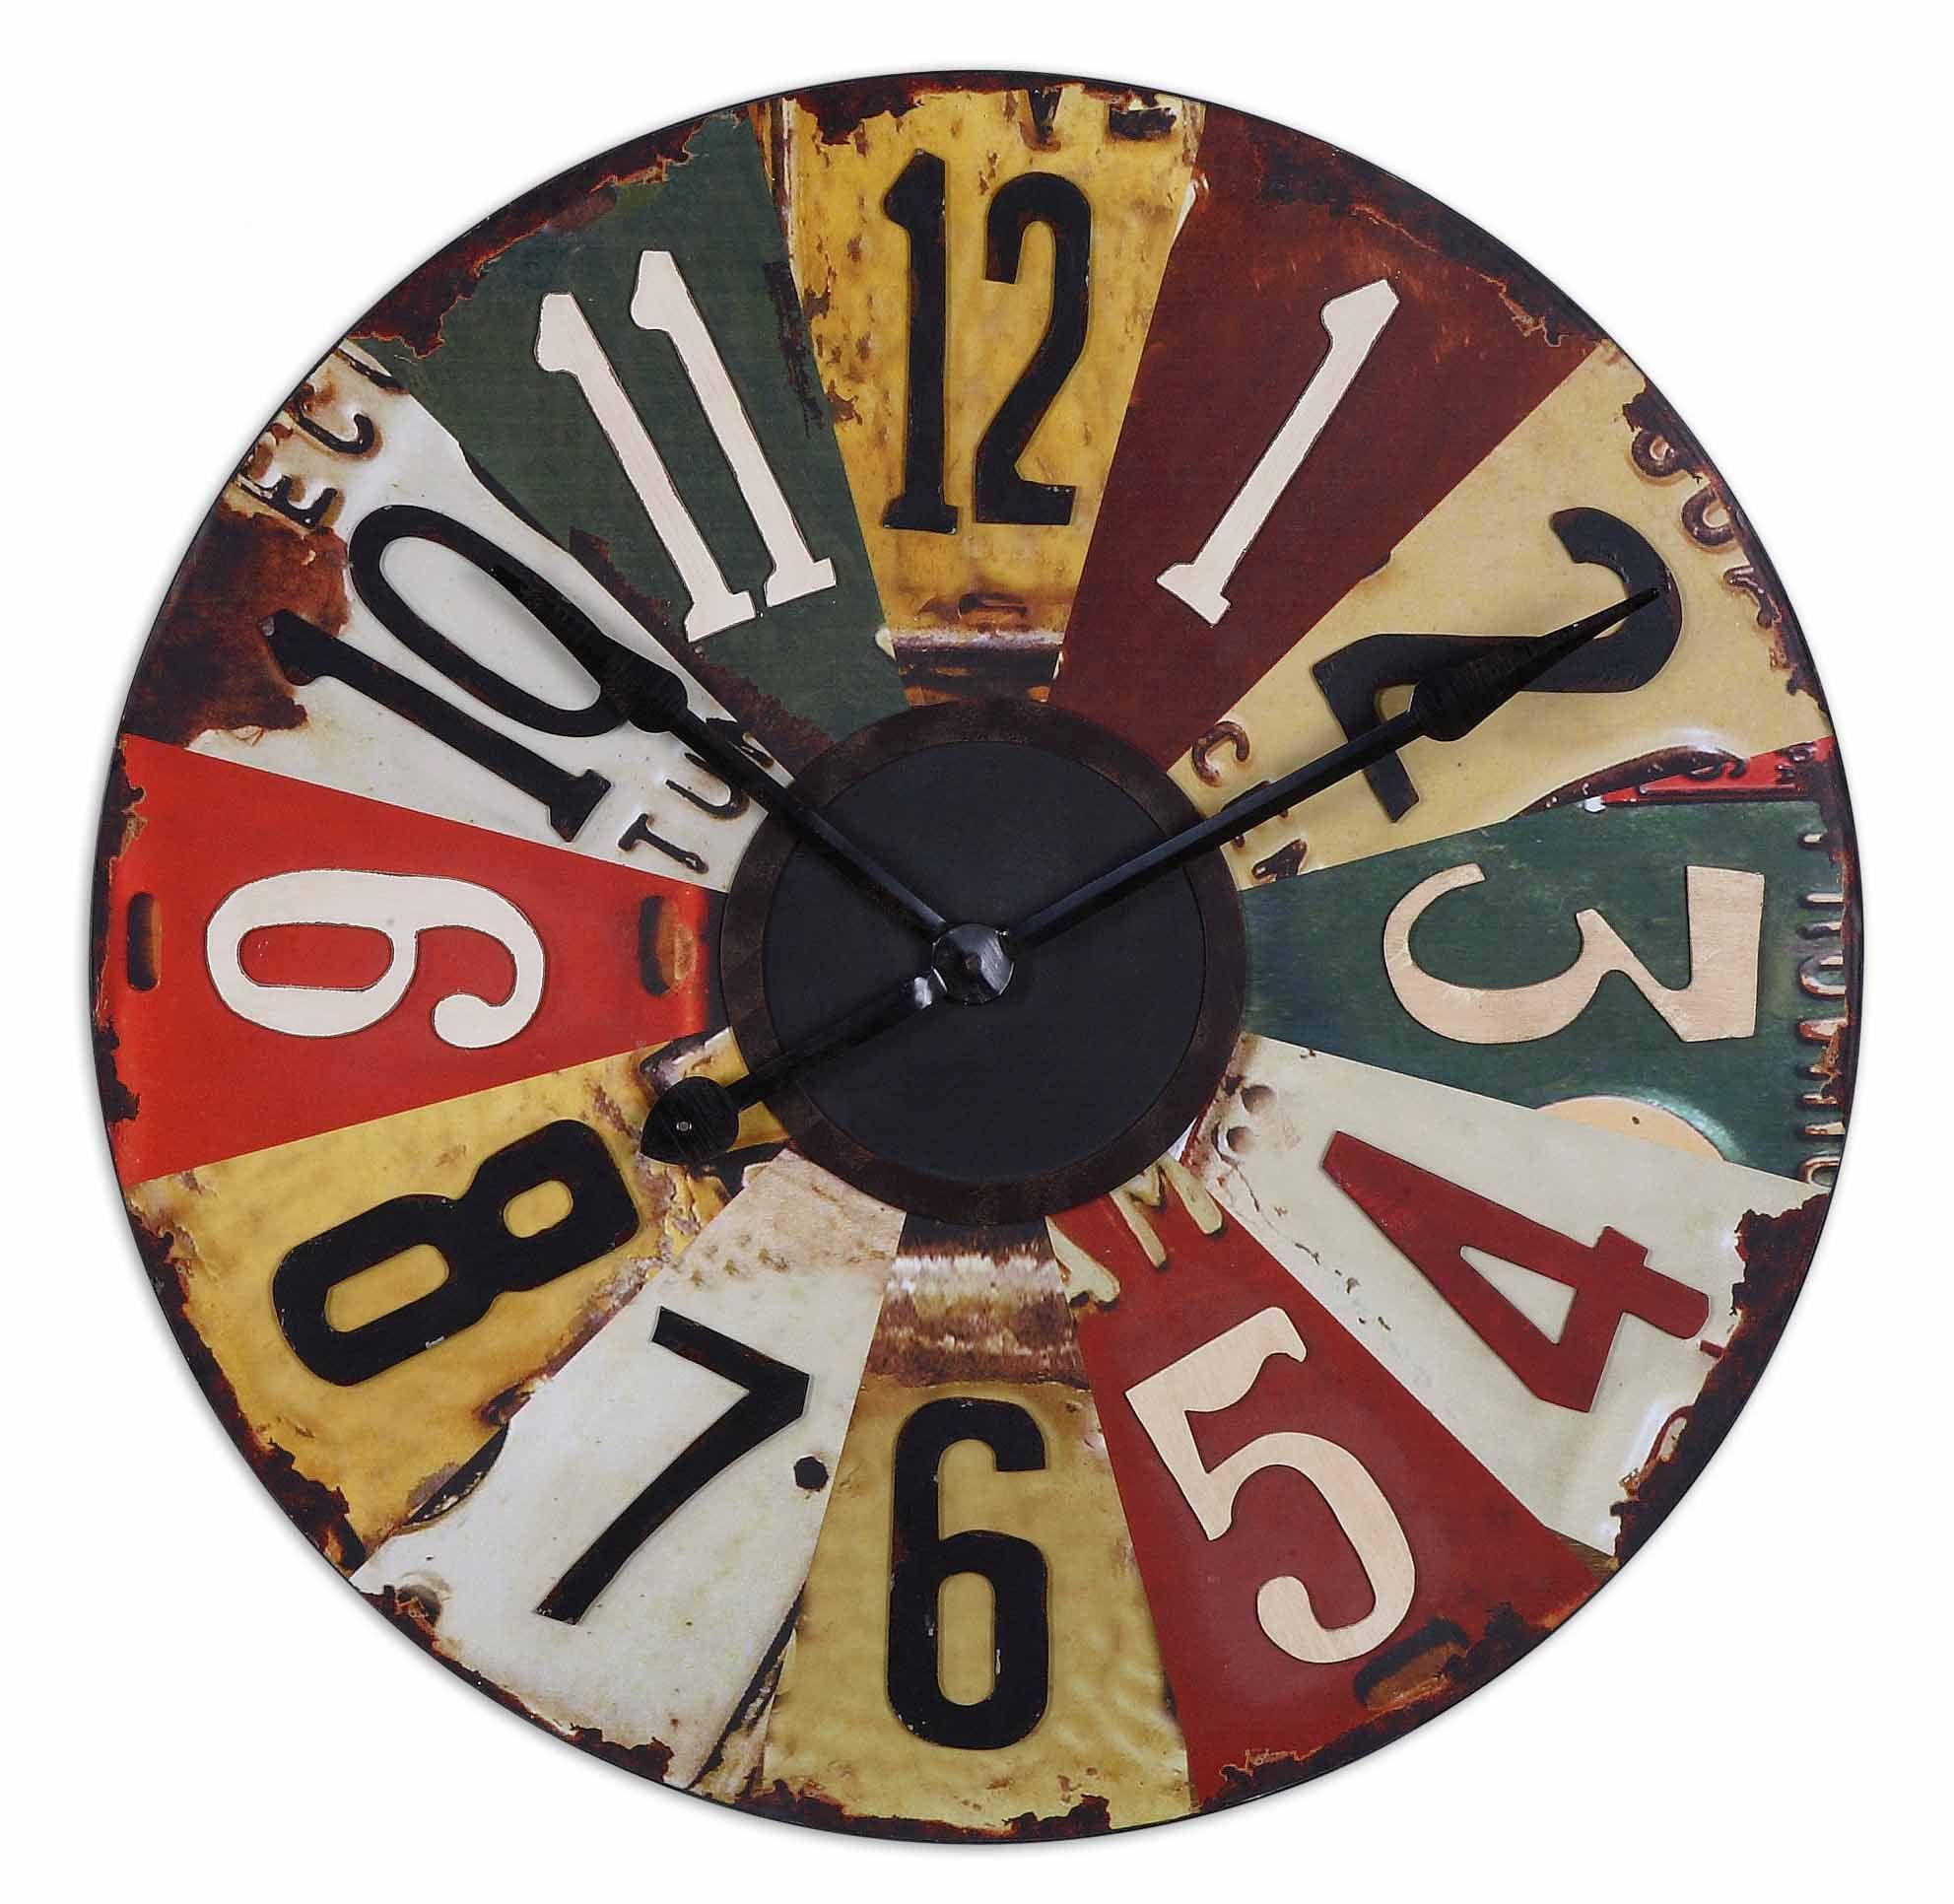 Uttermost Vintage Oversized 29 License Plates Wall Clock Clock Plates On Wall Wall Clock